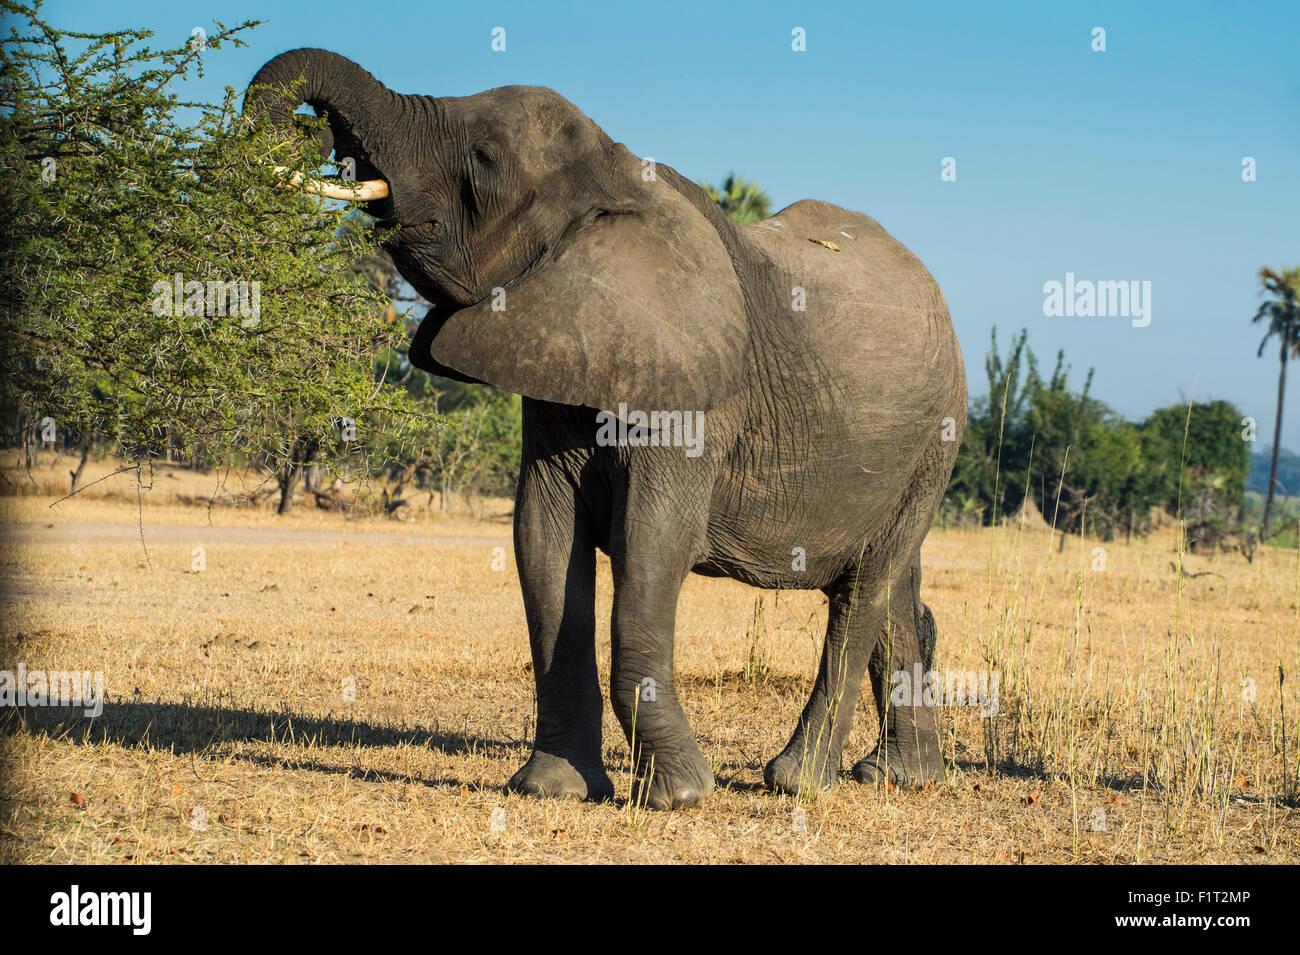 Bush africano Elefante africano (Loxodonta africana) mangiare da un albero, Liwonde National Park, Malawi, Africa Immagini Stock